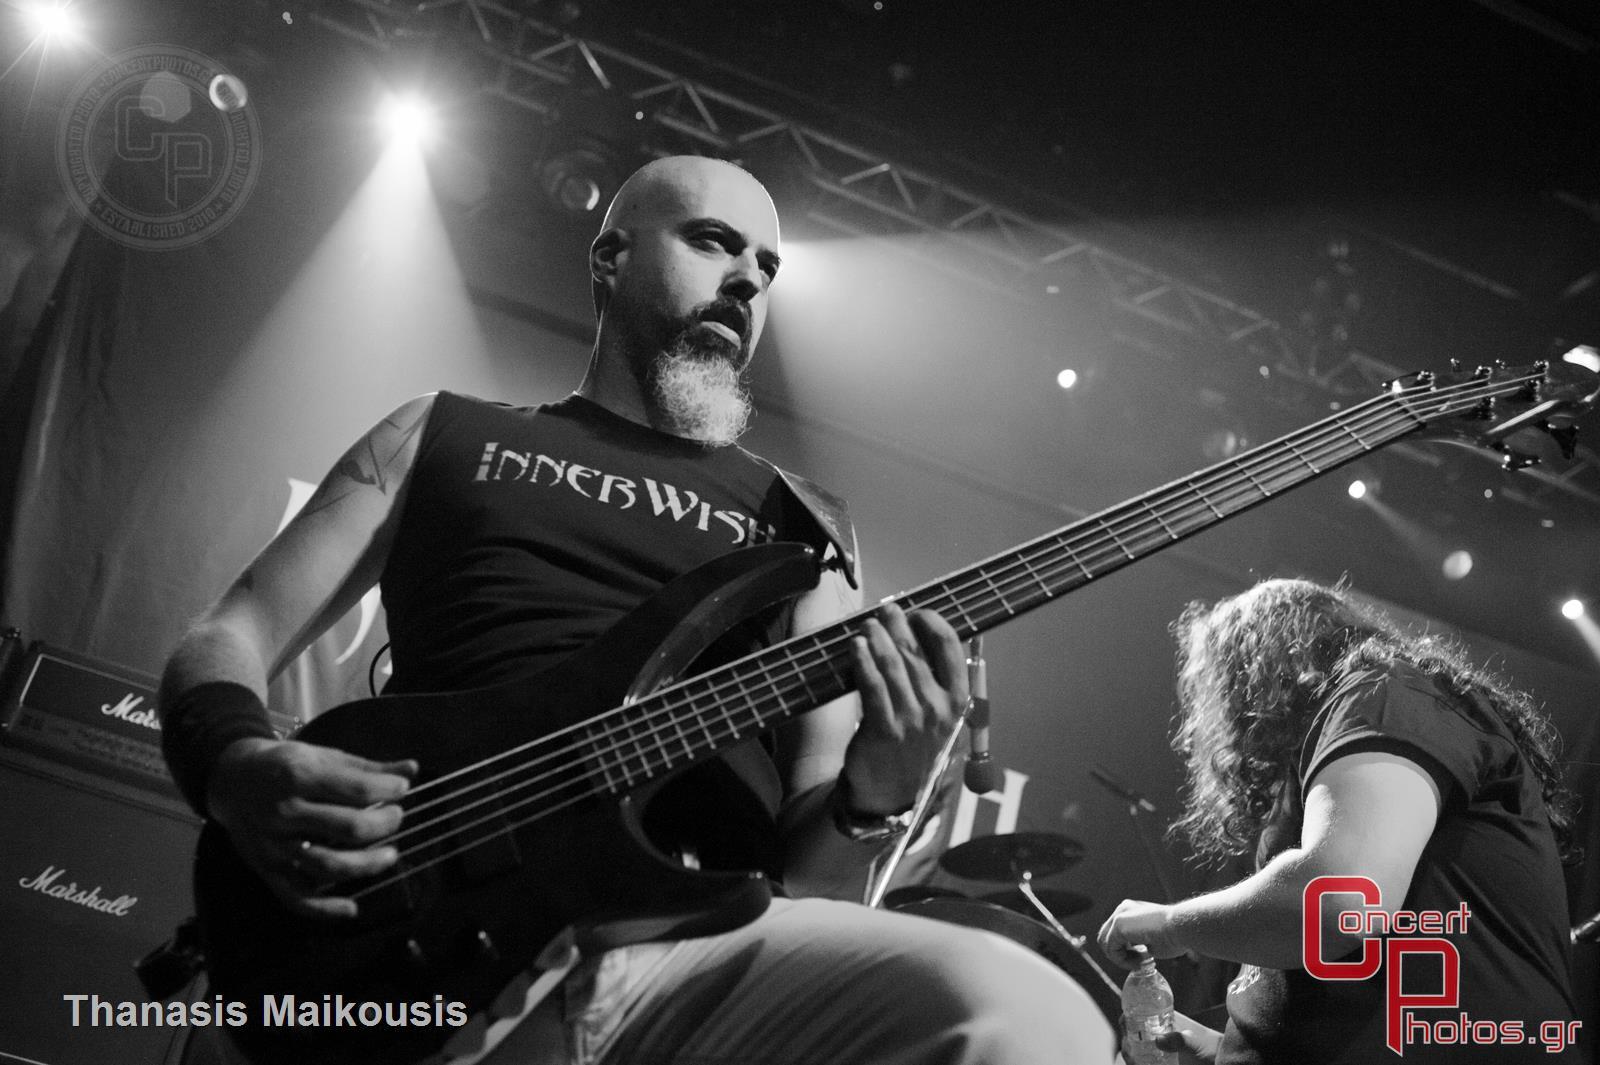 Saxon & Innerwish -Saxon Innerwish Gagarin photographer: Thanasis Maikousis - concertphotos_20141025_21_07_17